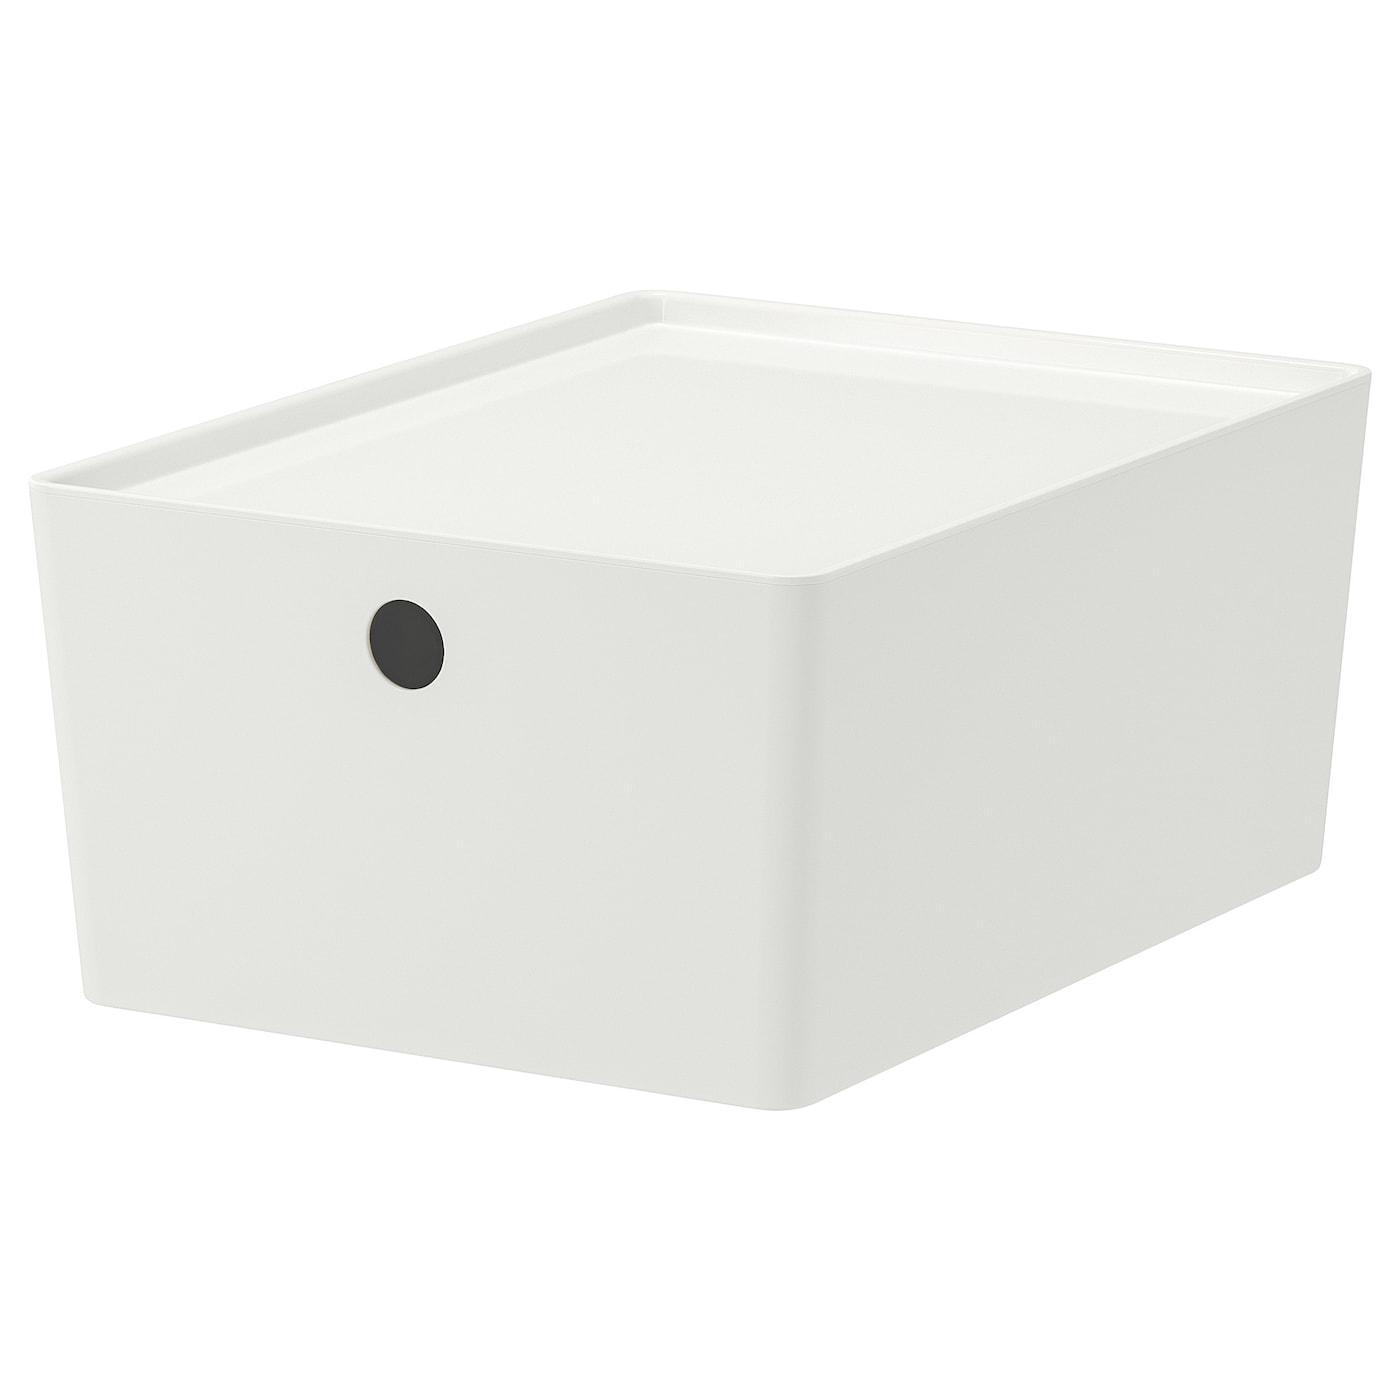 KUGGIS クッギス ふた付きボックス